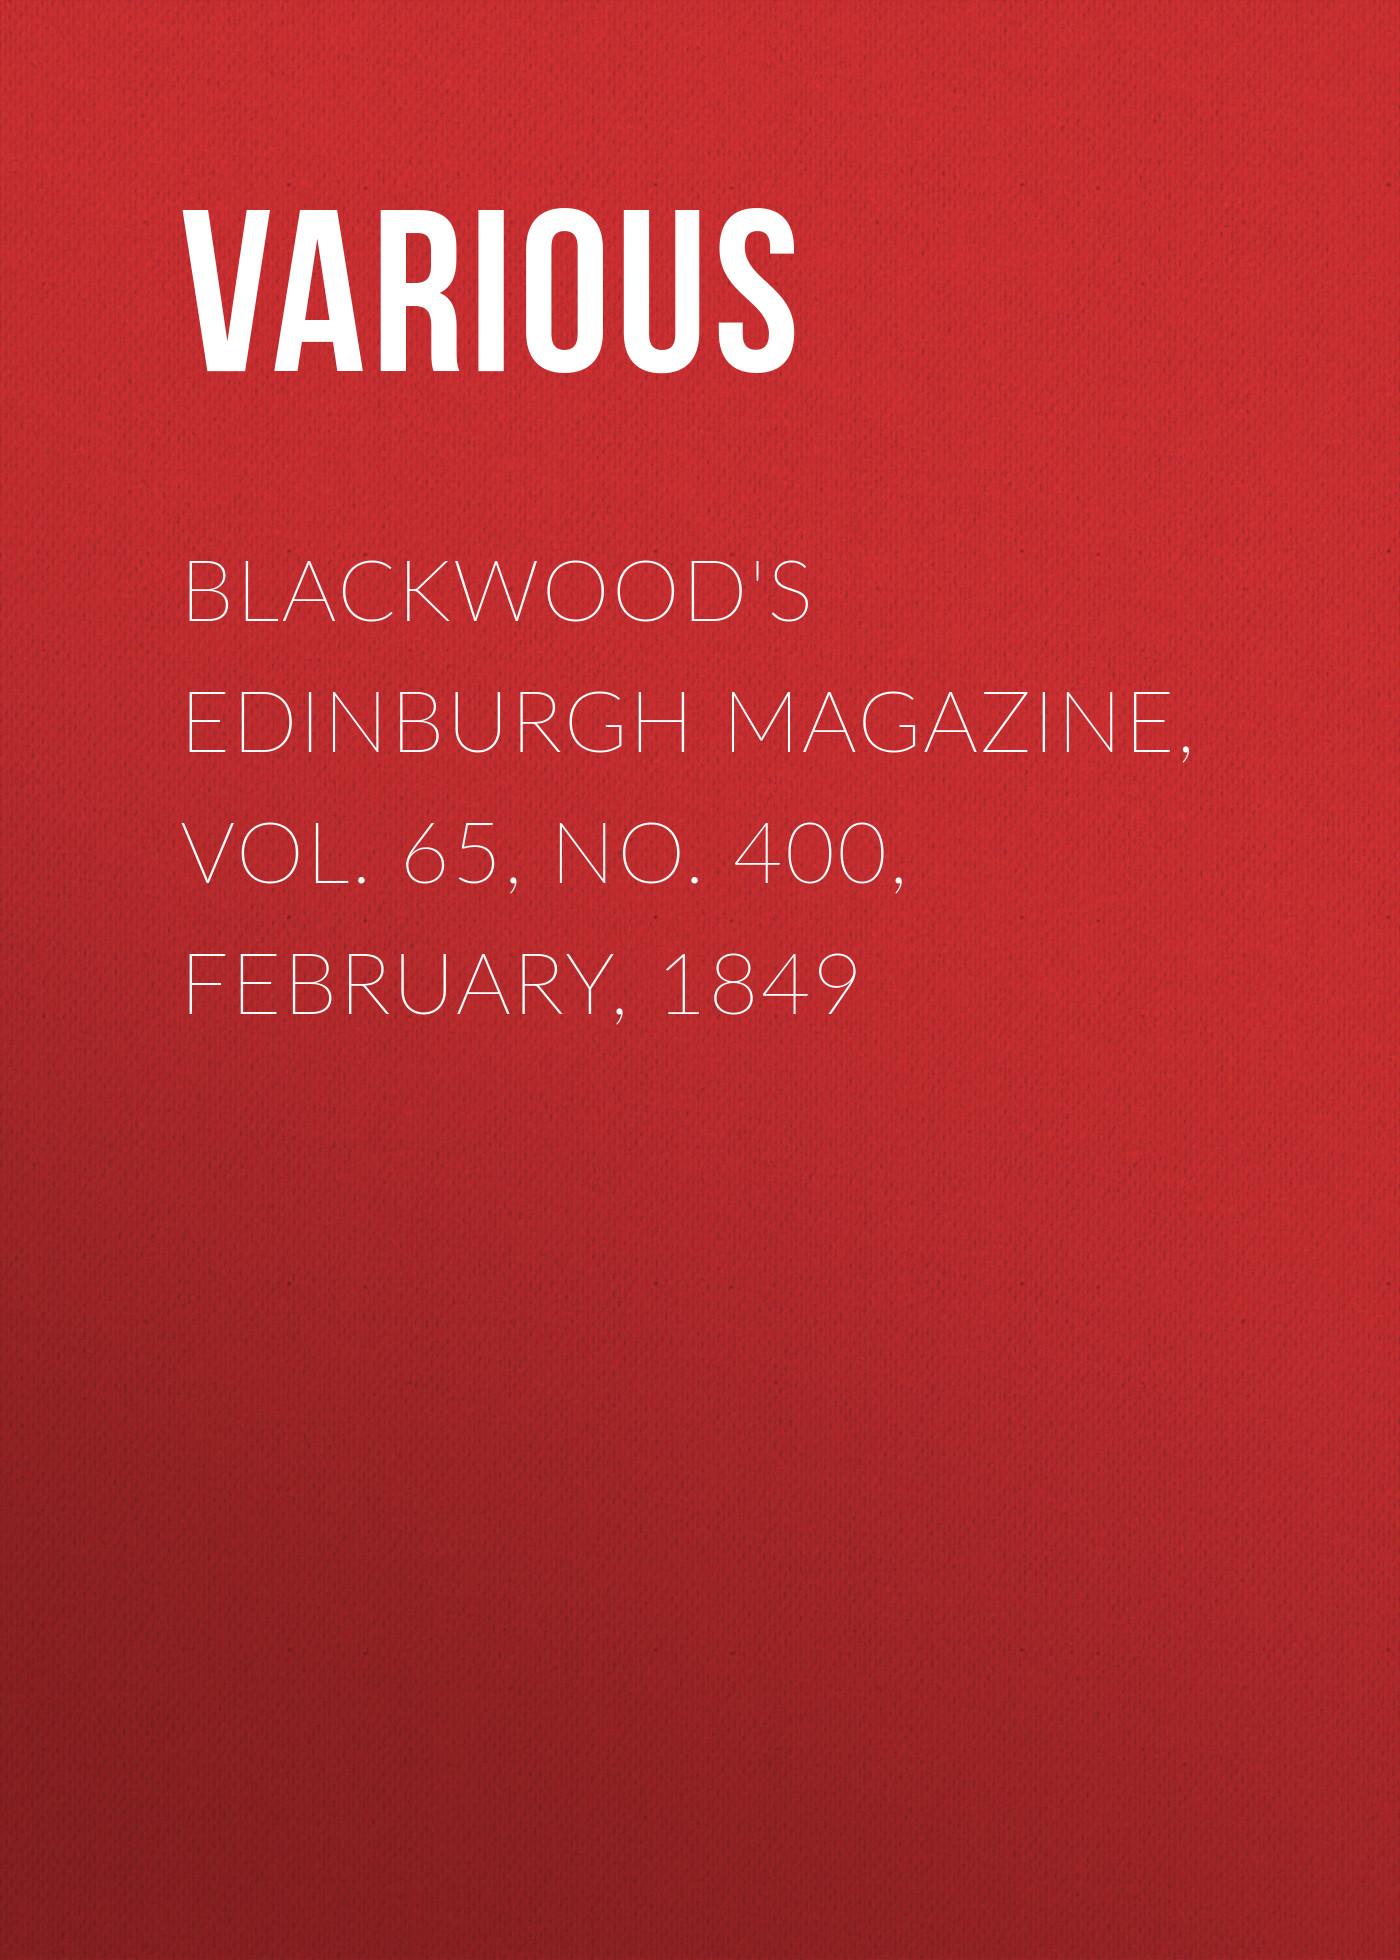 Various Blackwood's Edinburgh Magazine, Vol. 65, No. 400, February, 1849 various blackwood s edinburgh magazine no 404 june 1849